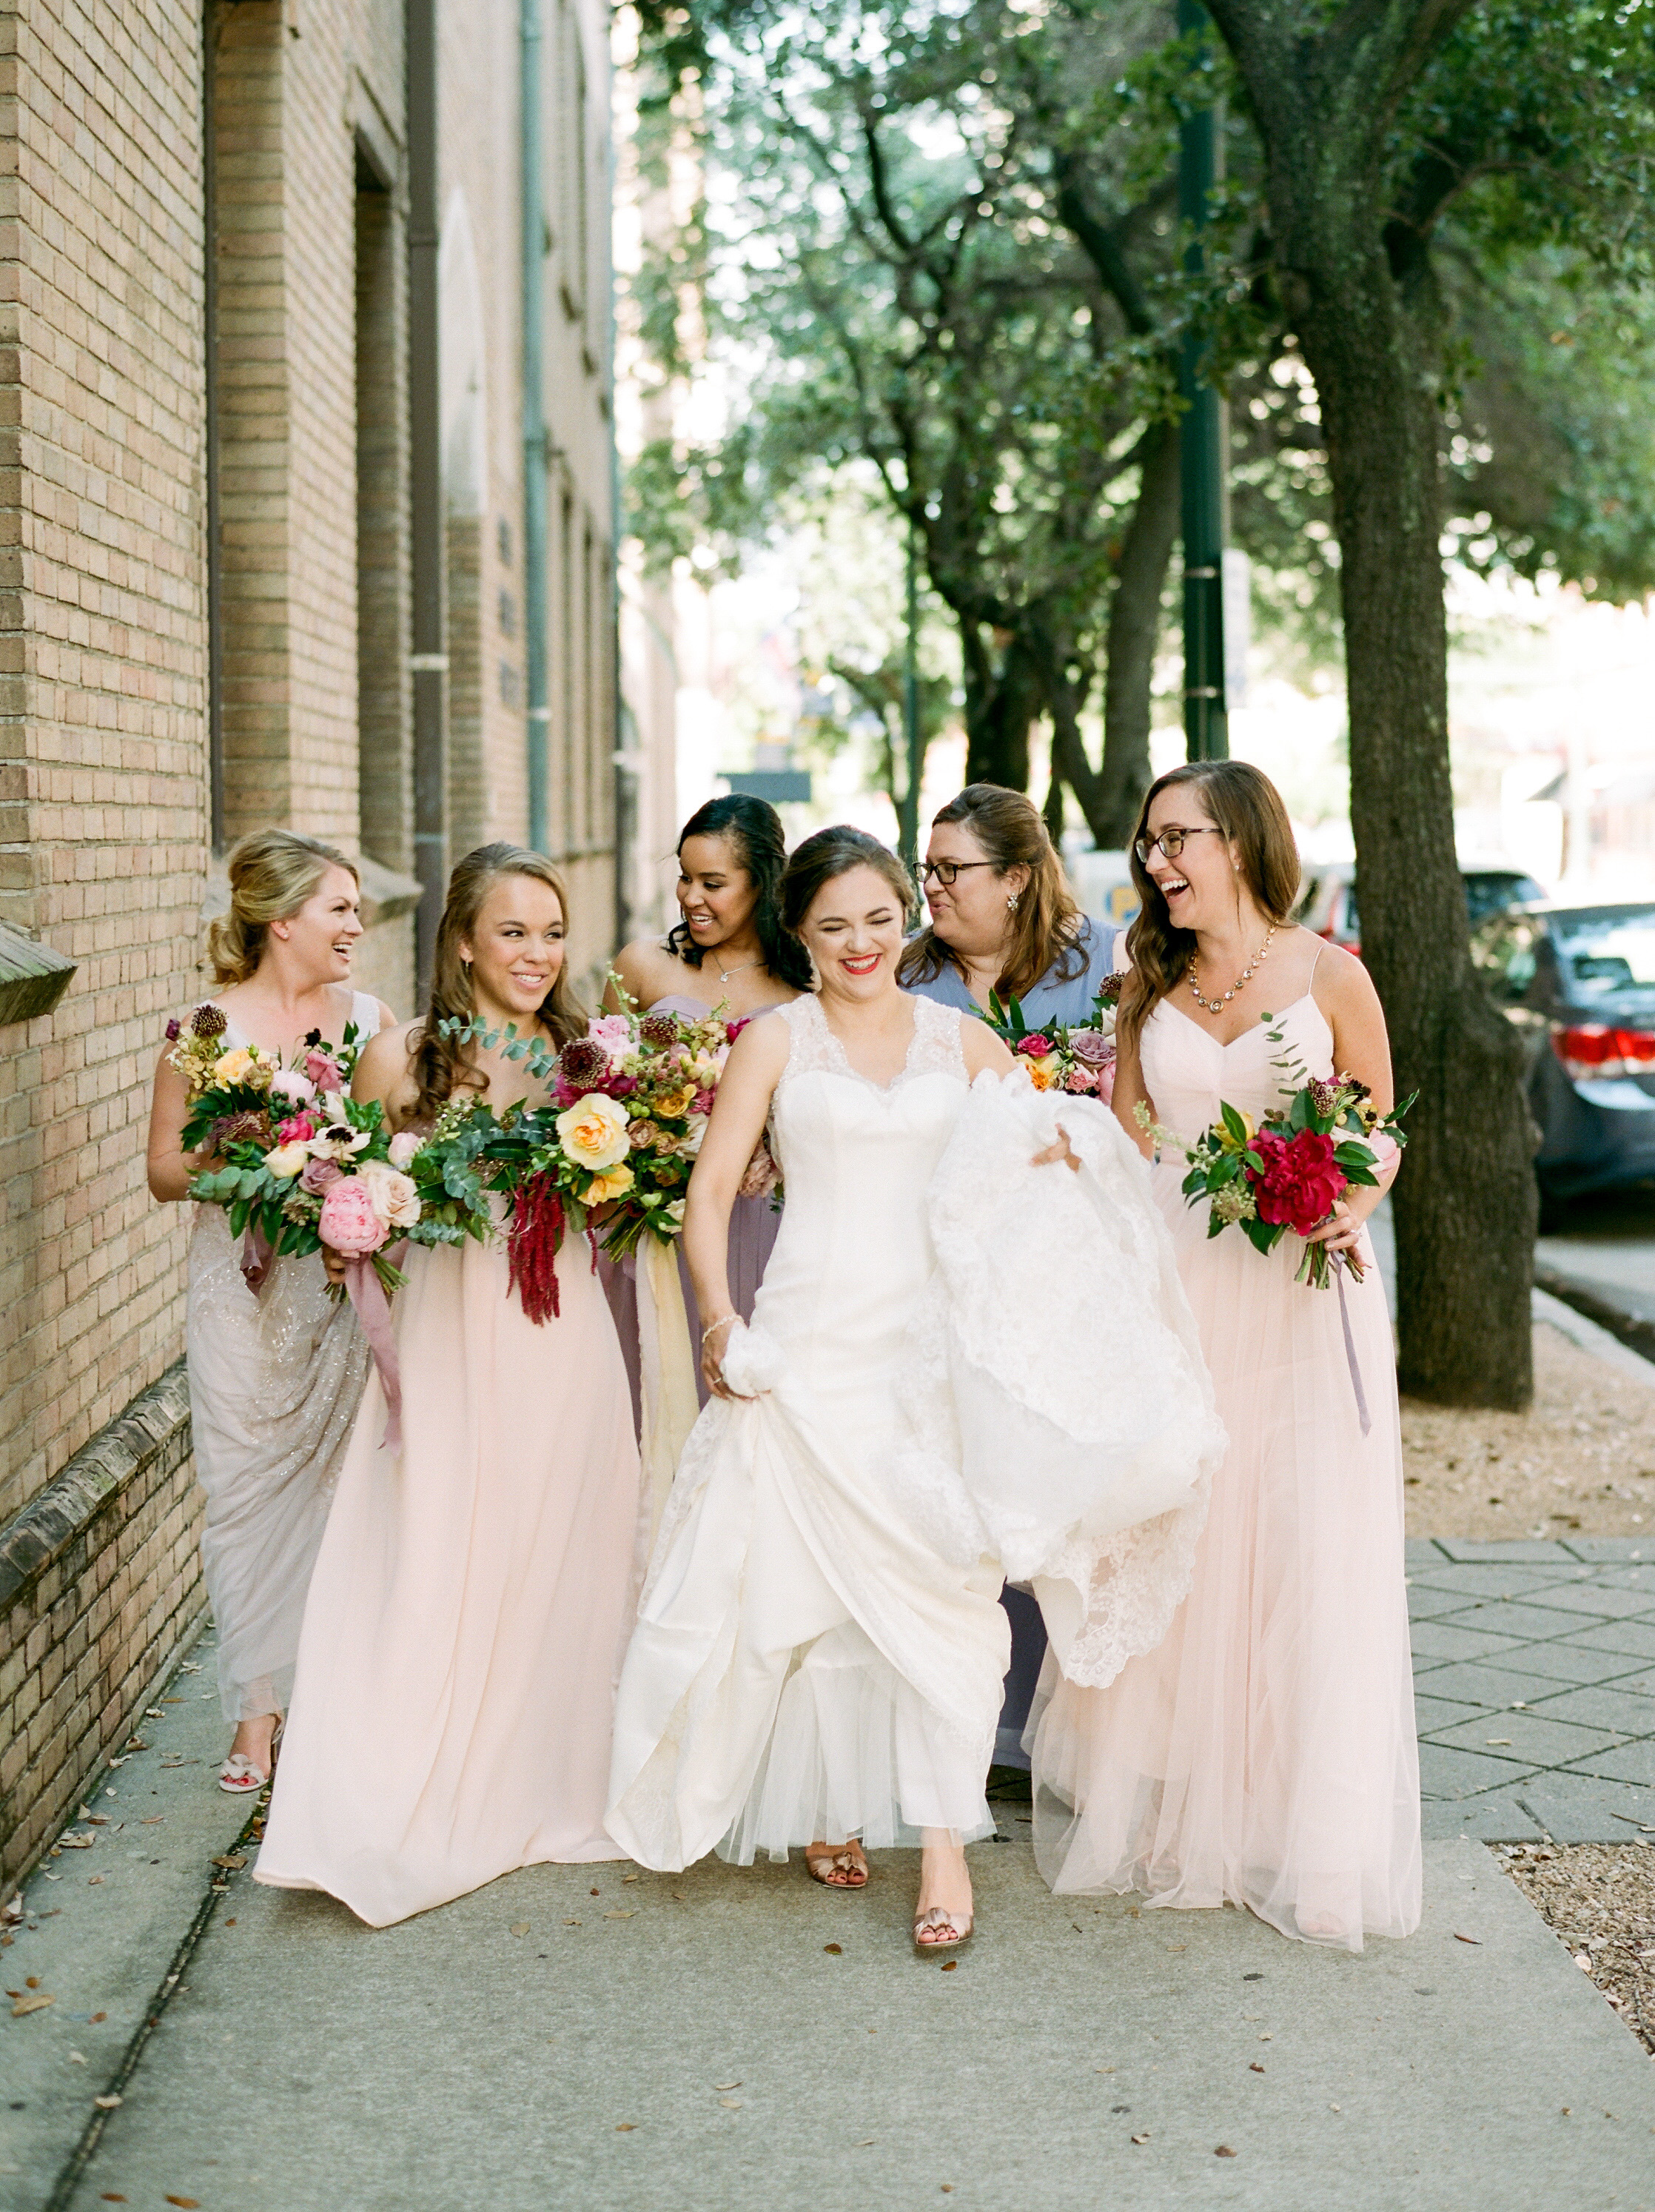 The-Knot-Texas-Fine-Art-Wedding-Film-Destination-Photographer-Houston-Austin-Dallas-New-Orleans-Julia-Ideson-Library-Event-Dana-Josh-Fernandez-Photograph-Top-Best-31.jpg